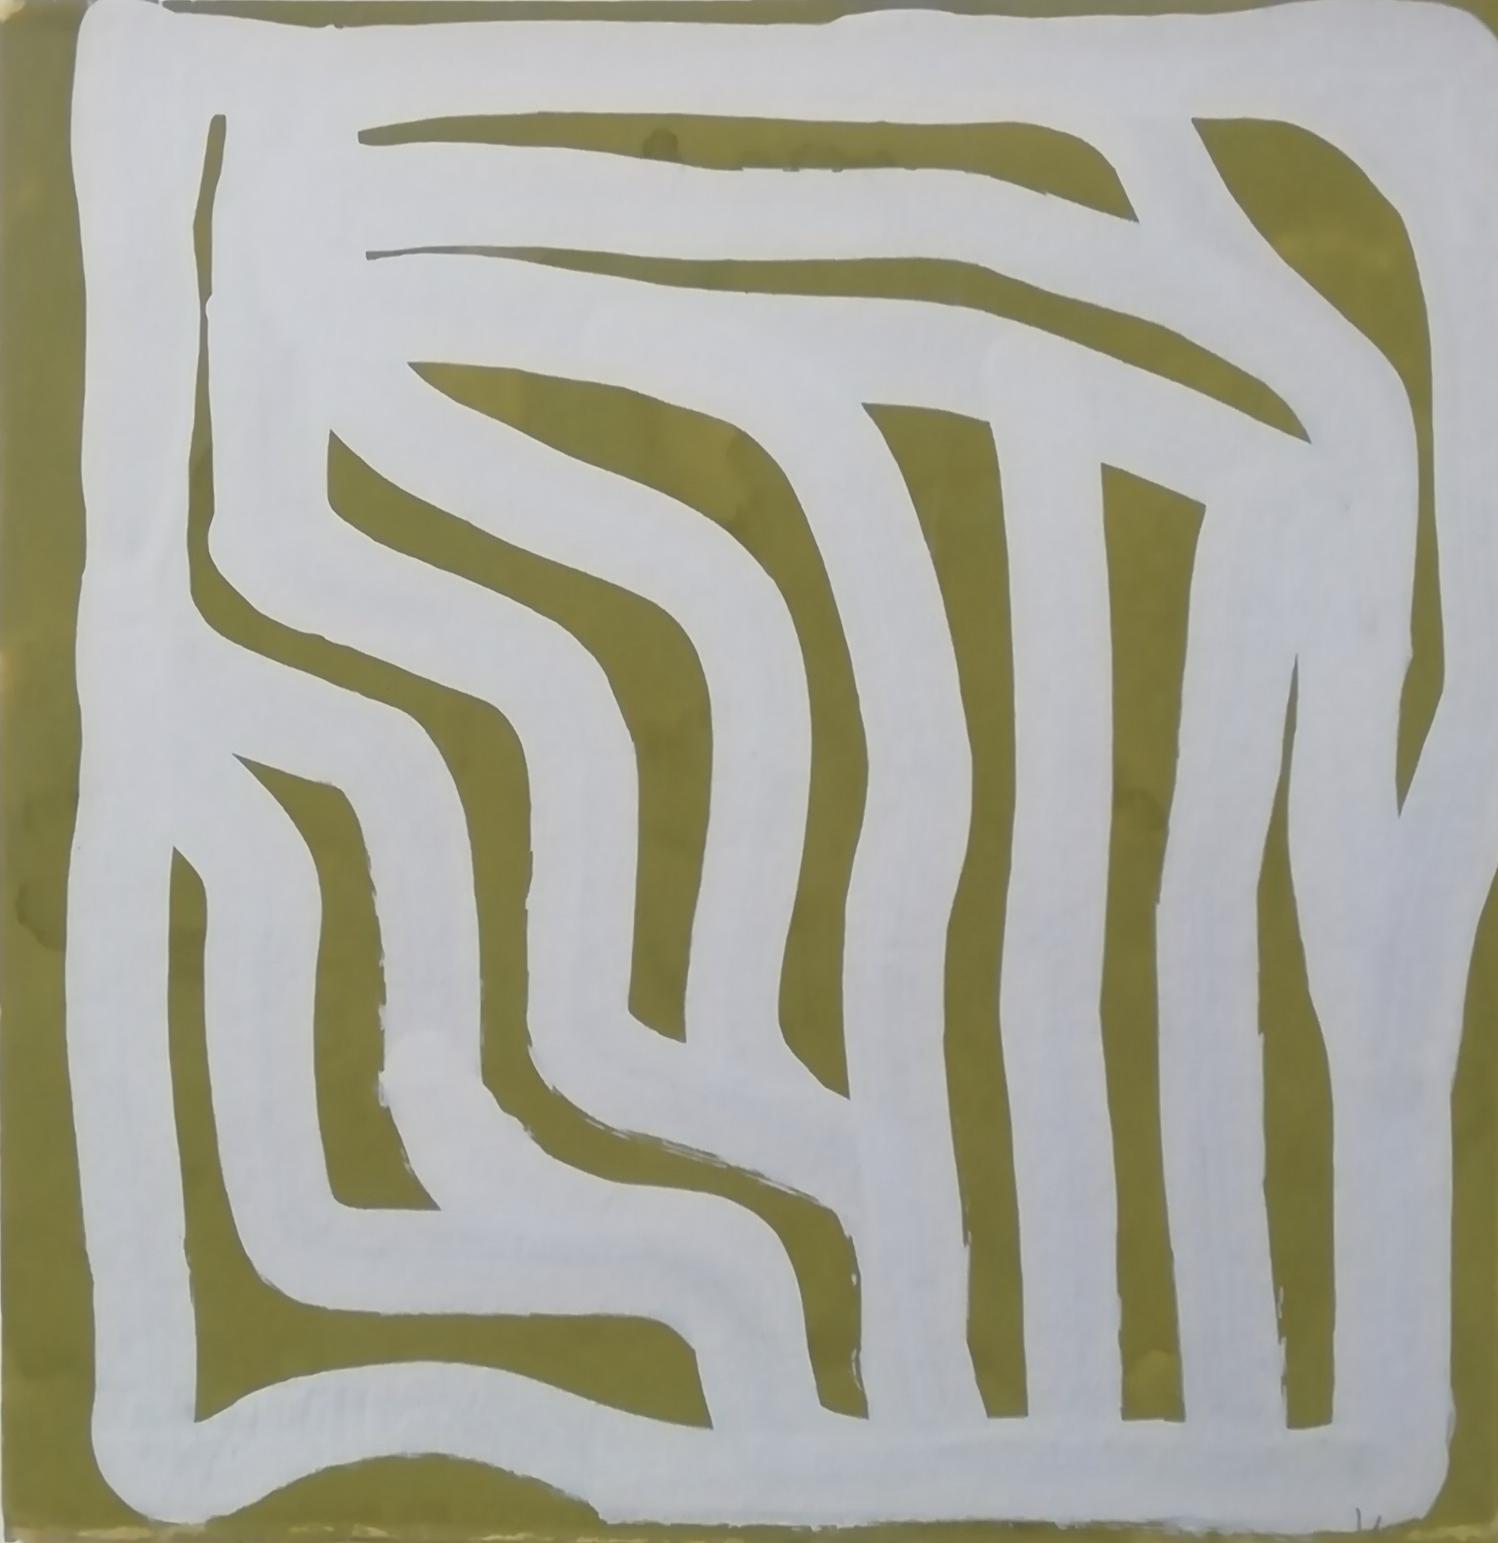 """Parallel curves"" 1990, gouache su carta, 28.5 x 28.5 cm"